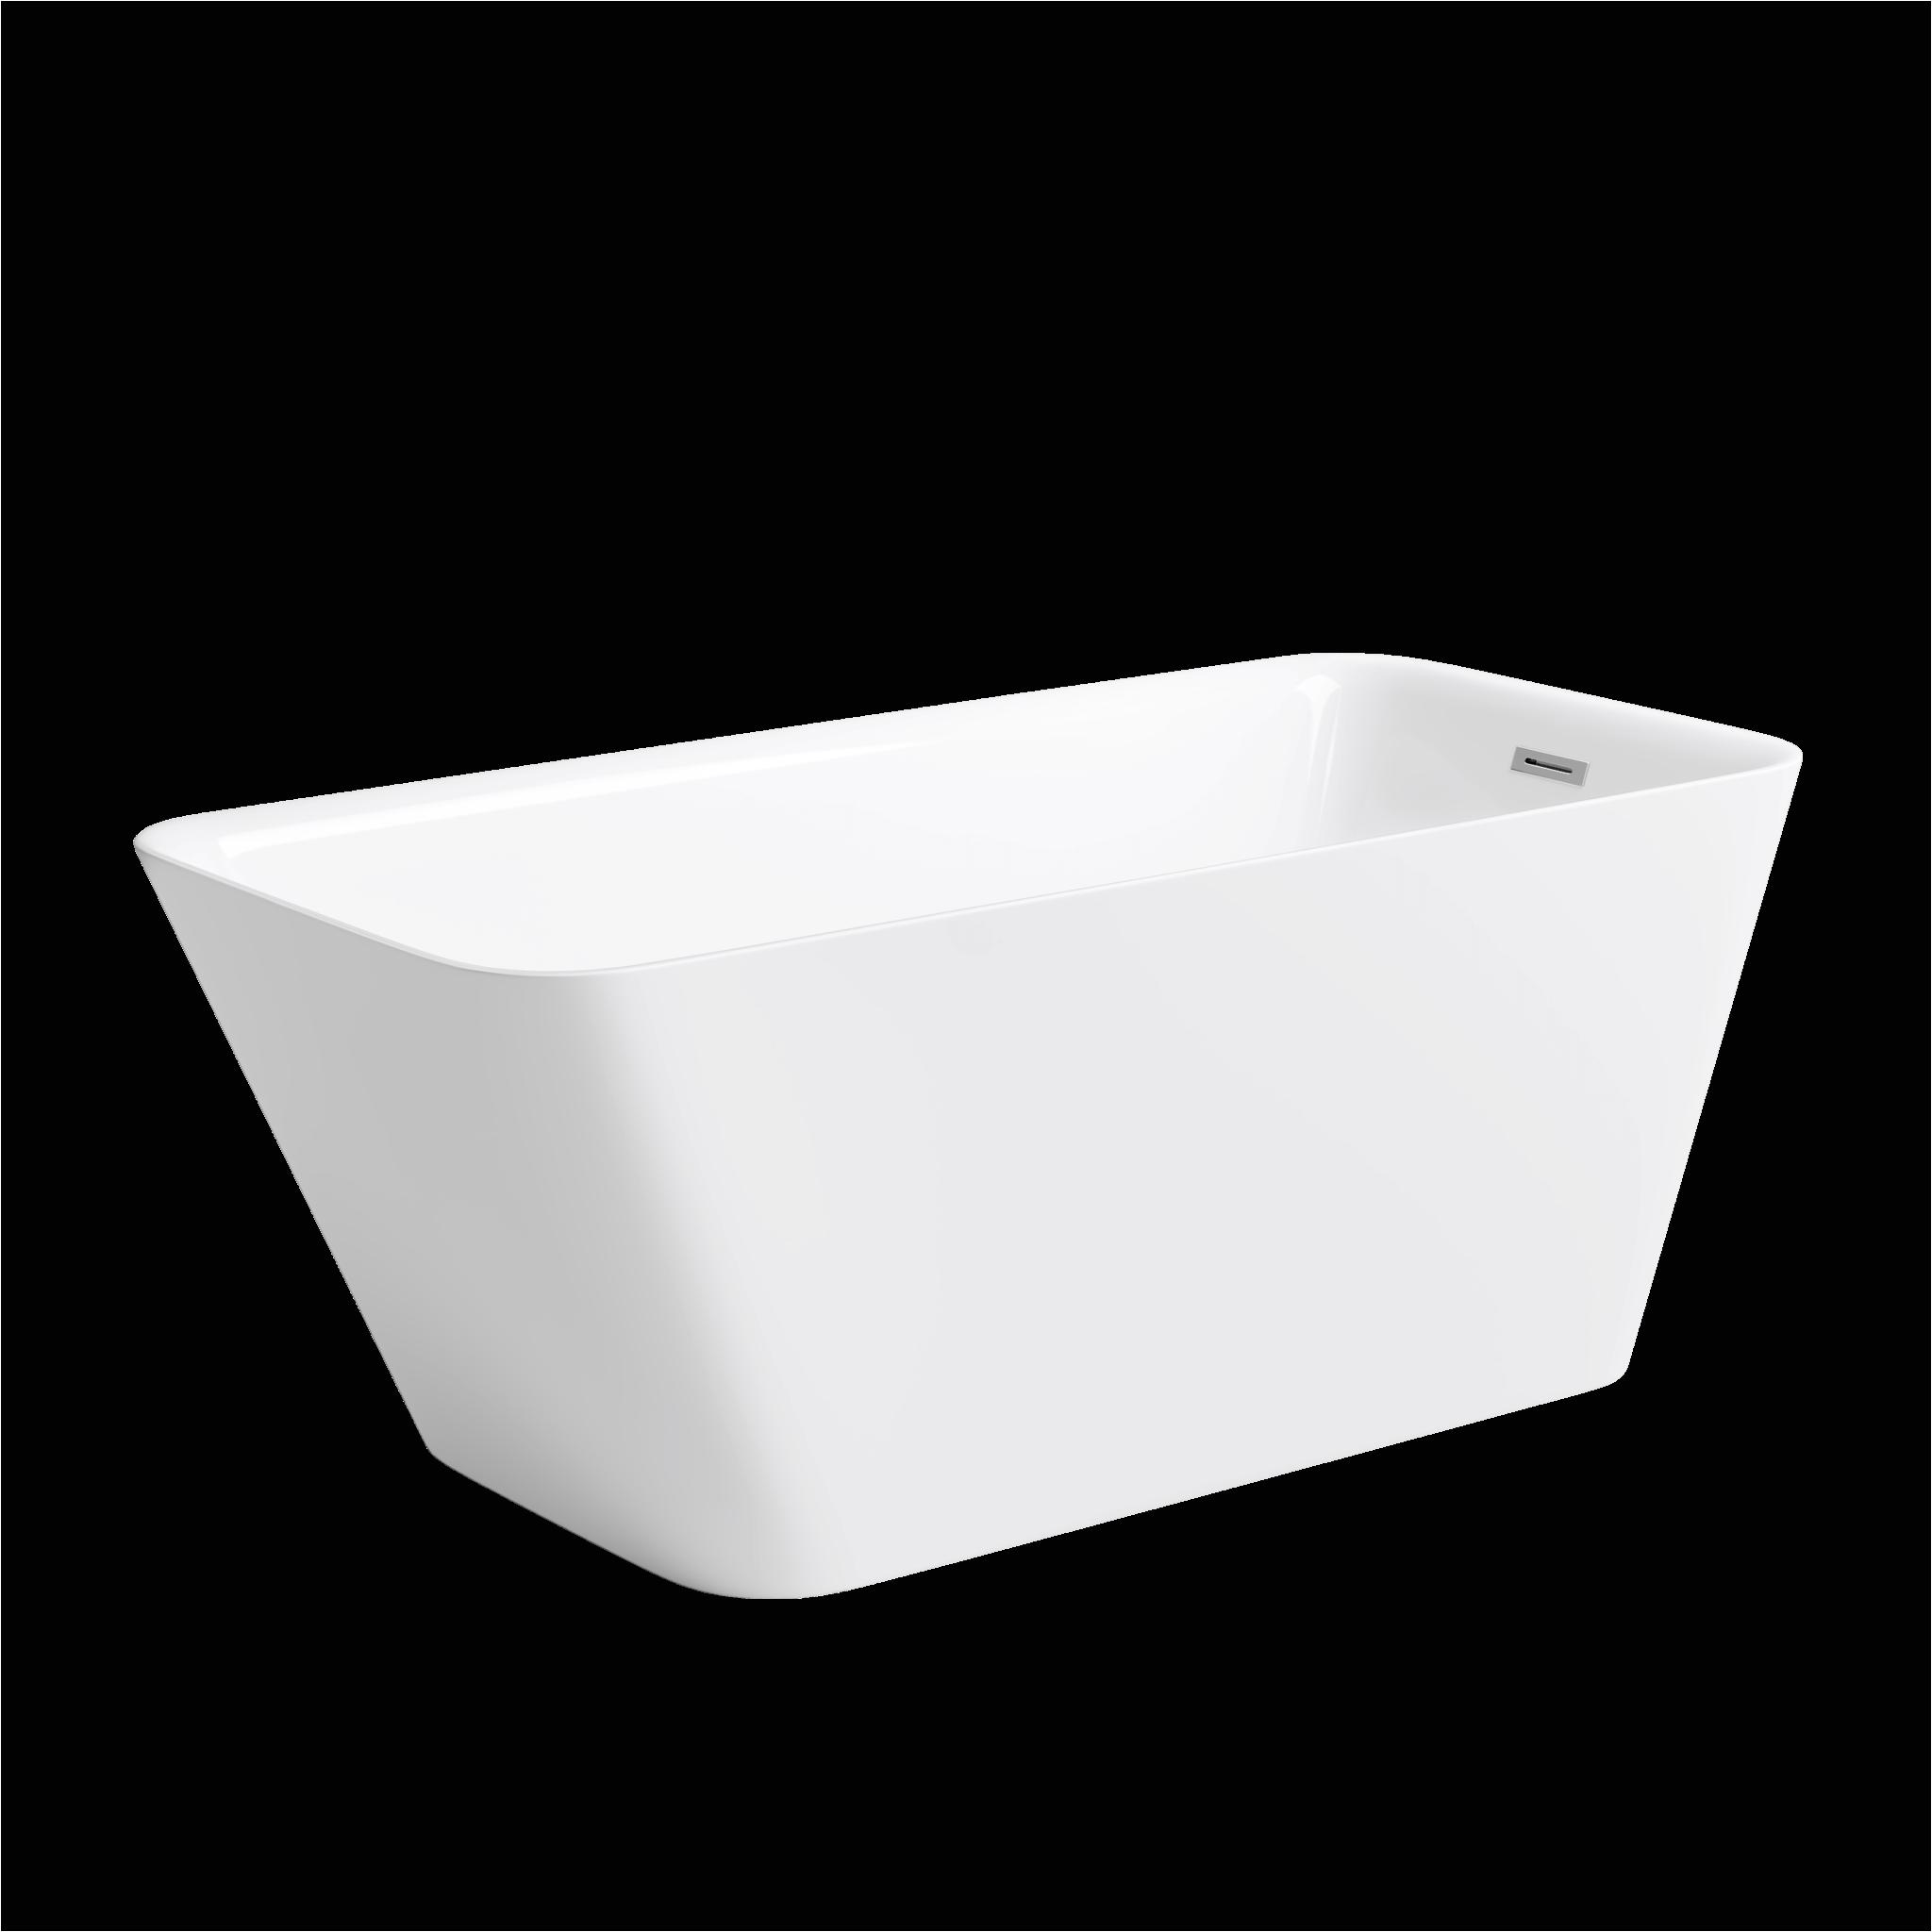 "York Freestanding Bathtub 59"" Stanley Freestanding Bathtub"